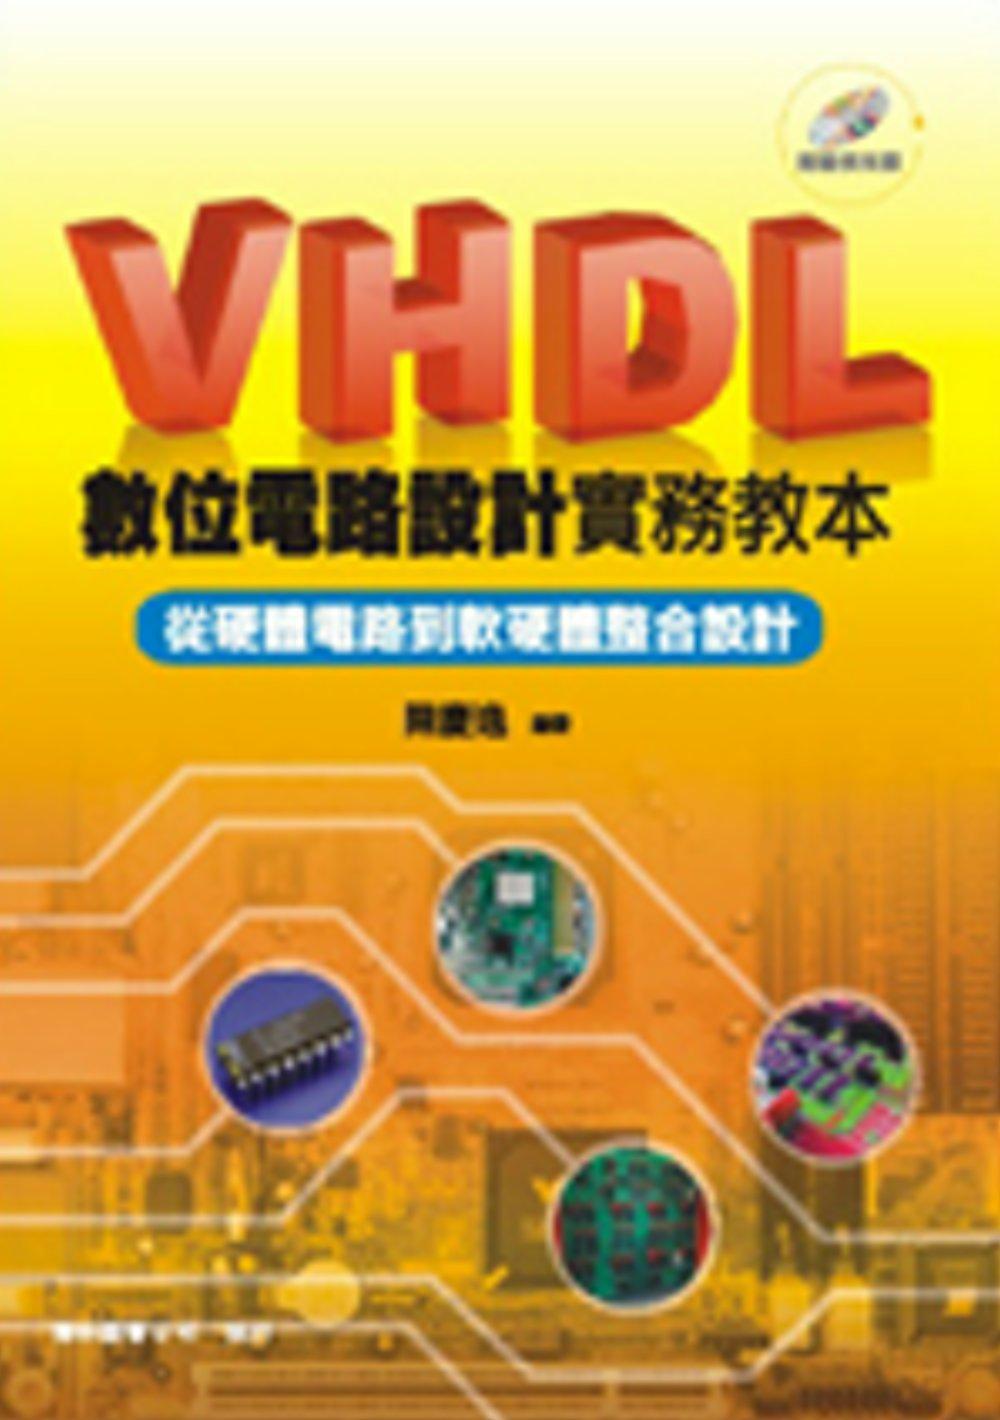 VHDL 數位電路設計實務教本:從硬體電路到軟硬體整合設計